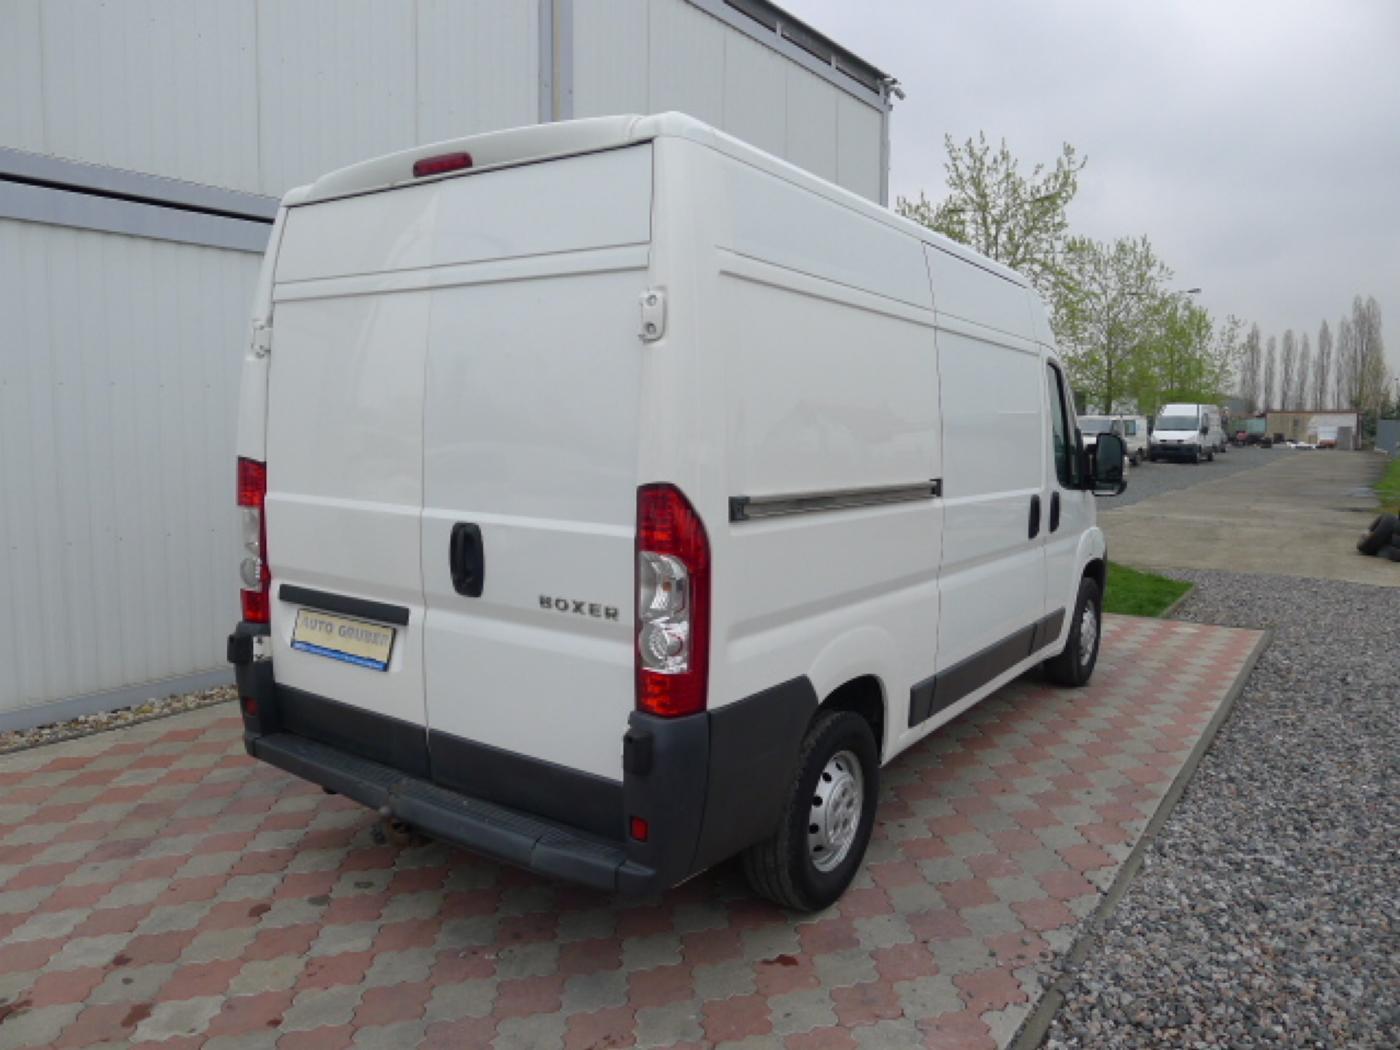 Peugeot Boxer 2.2 HDI L2H2 Klima Akce!!! Novinka - 3